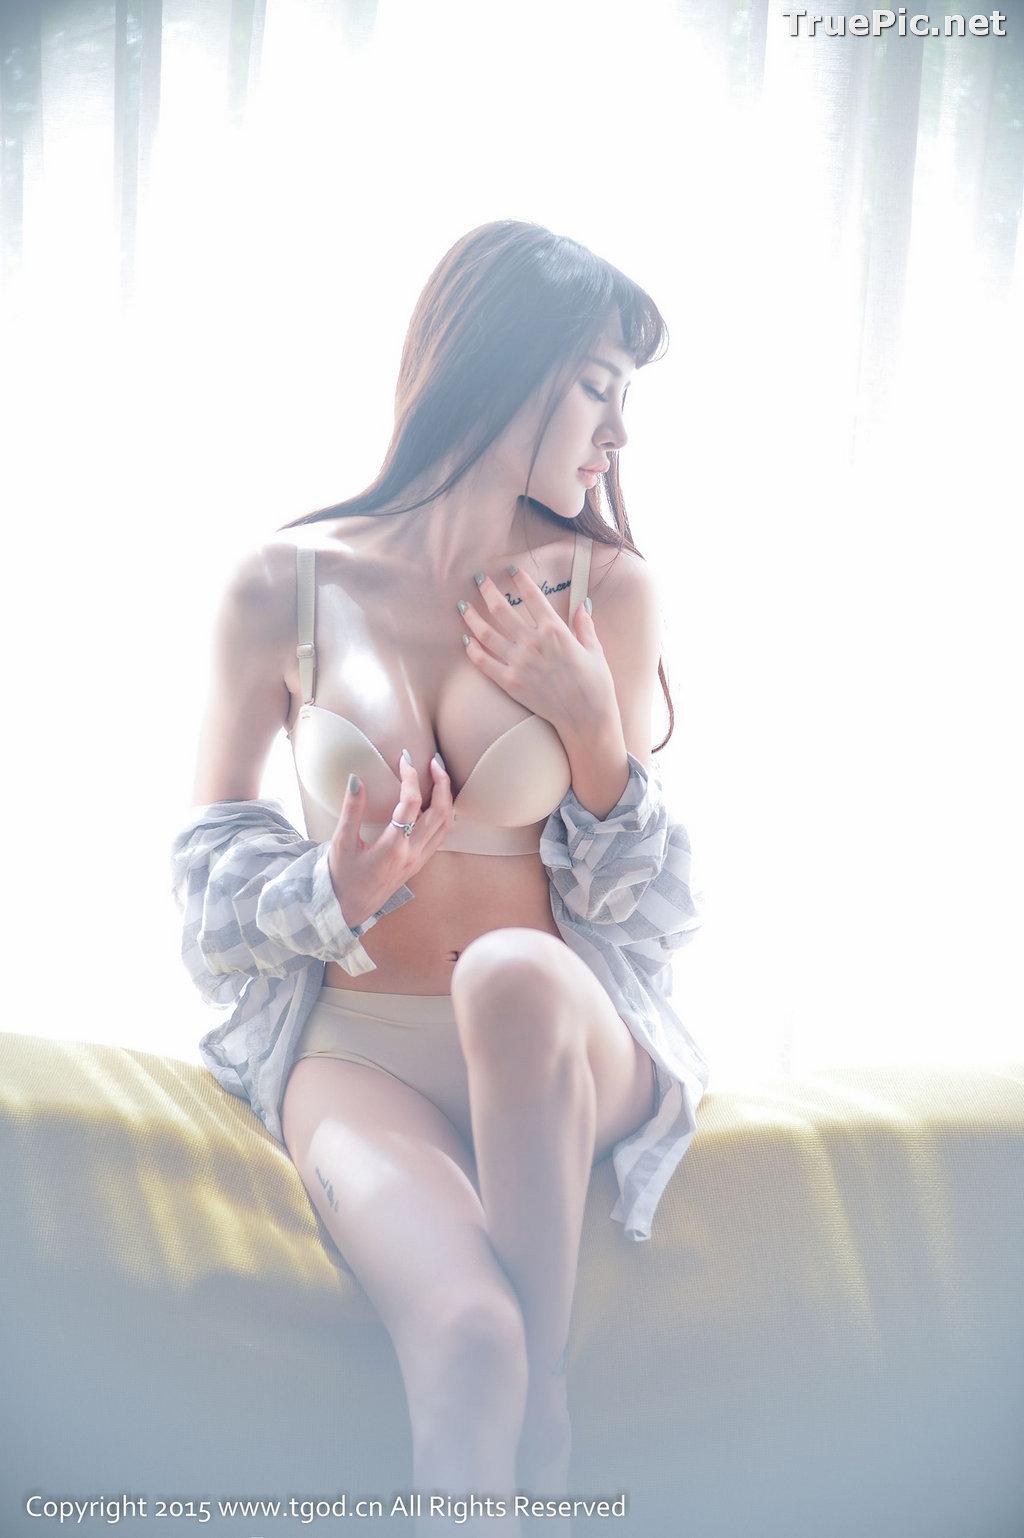 Image TGOD 2015-11-10 - Chinese Sexy Model - Cheryl (青树) - TruePic.net - Picture-3